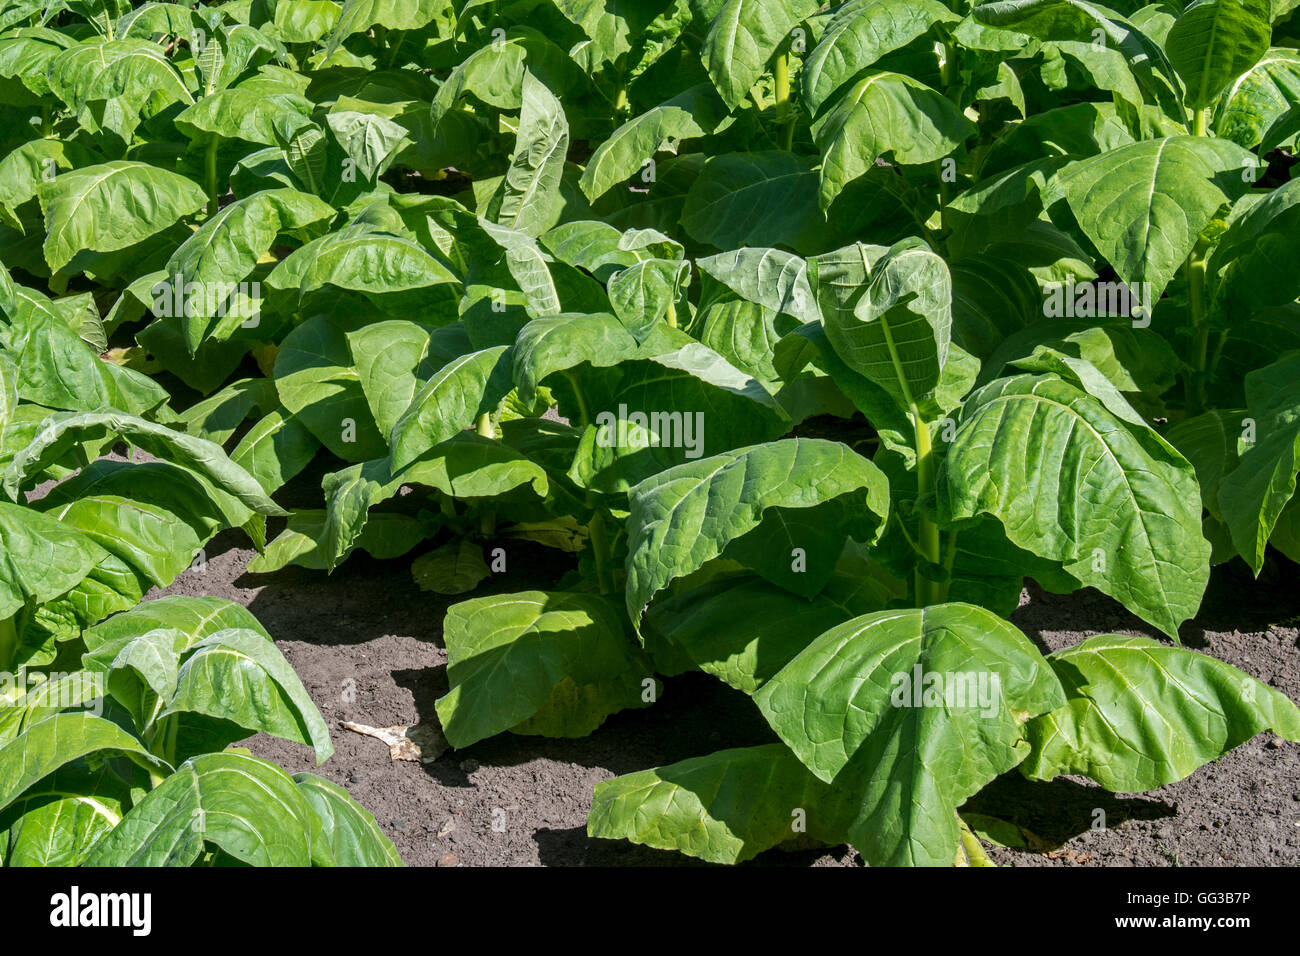 Aztec tobacco / wild tobacco (Nicotiana rustica) plants in field - Stock Image